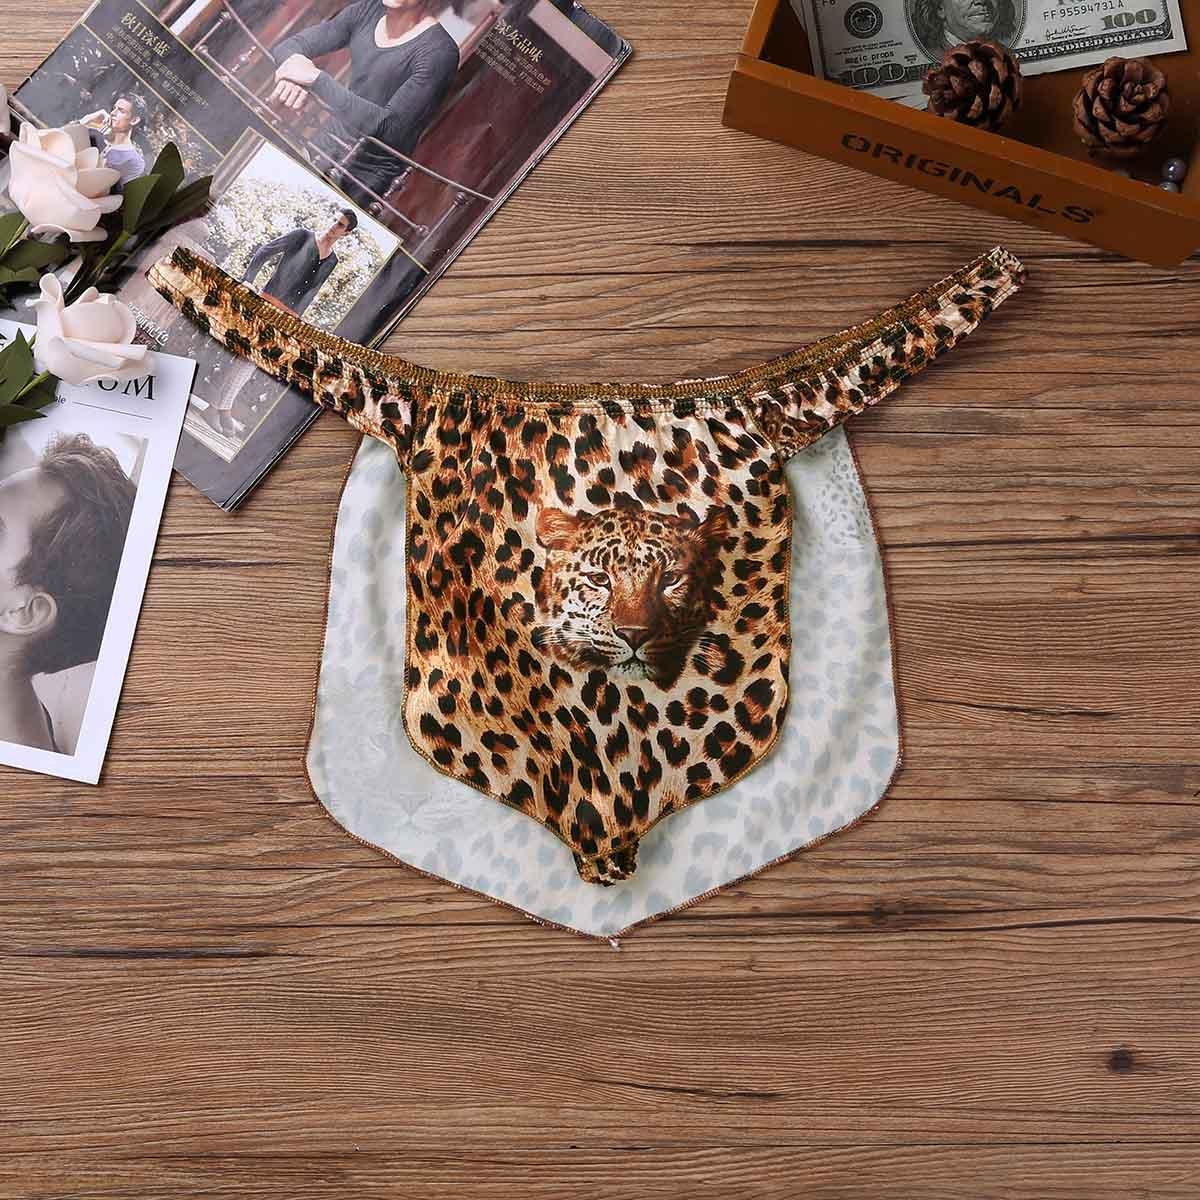 afc13cc79cac Amazon.com: YOOJIA Men's Leopard Print High Cut G-String Thong Underwear Jungle  Tarzan Cosplay Fancy Dress: Clothing